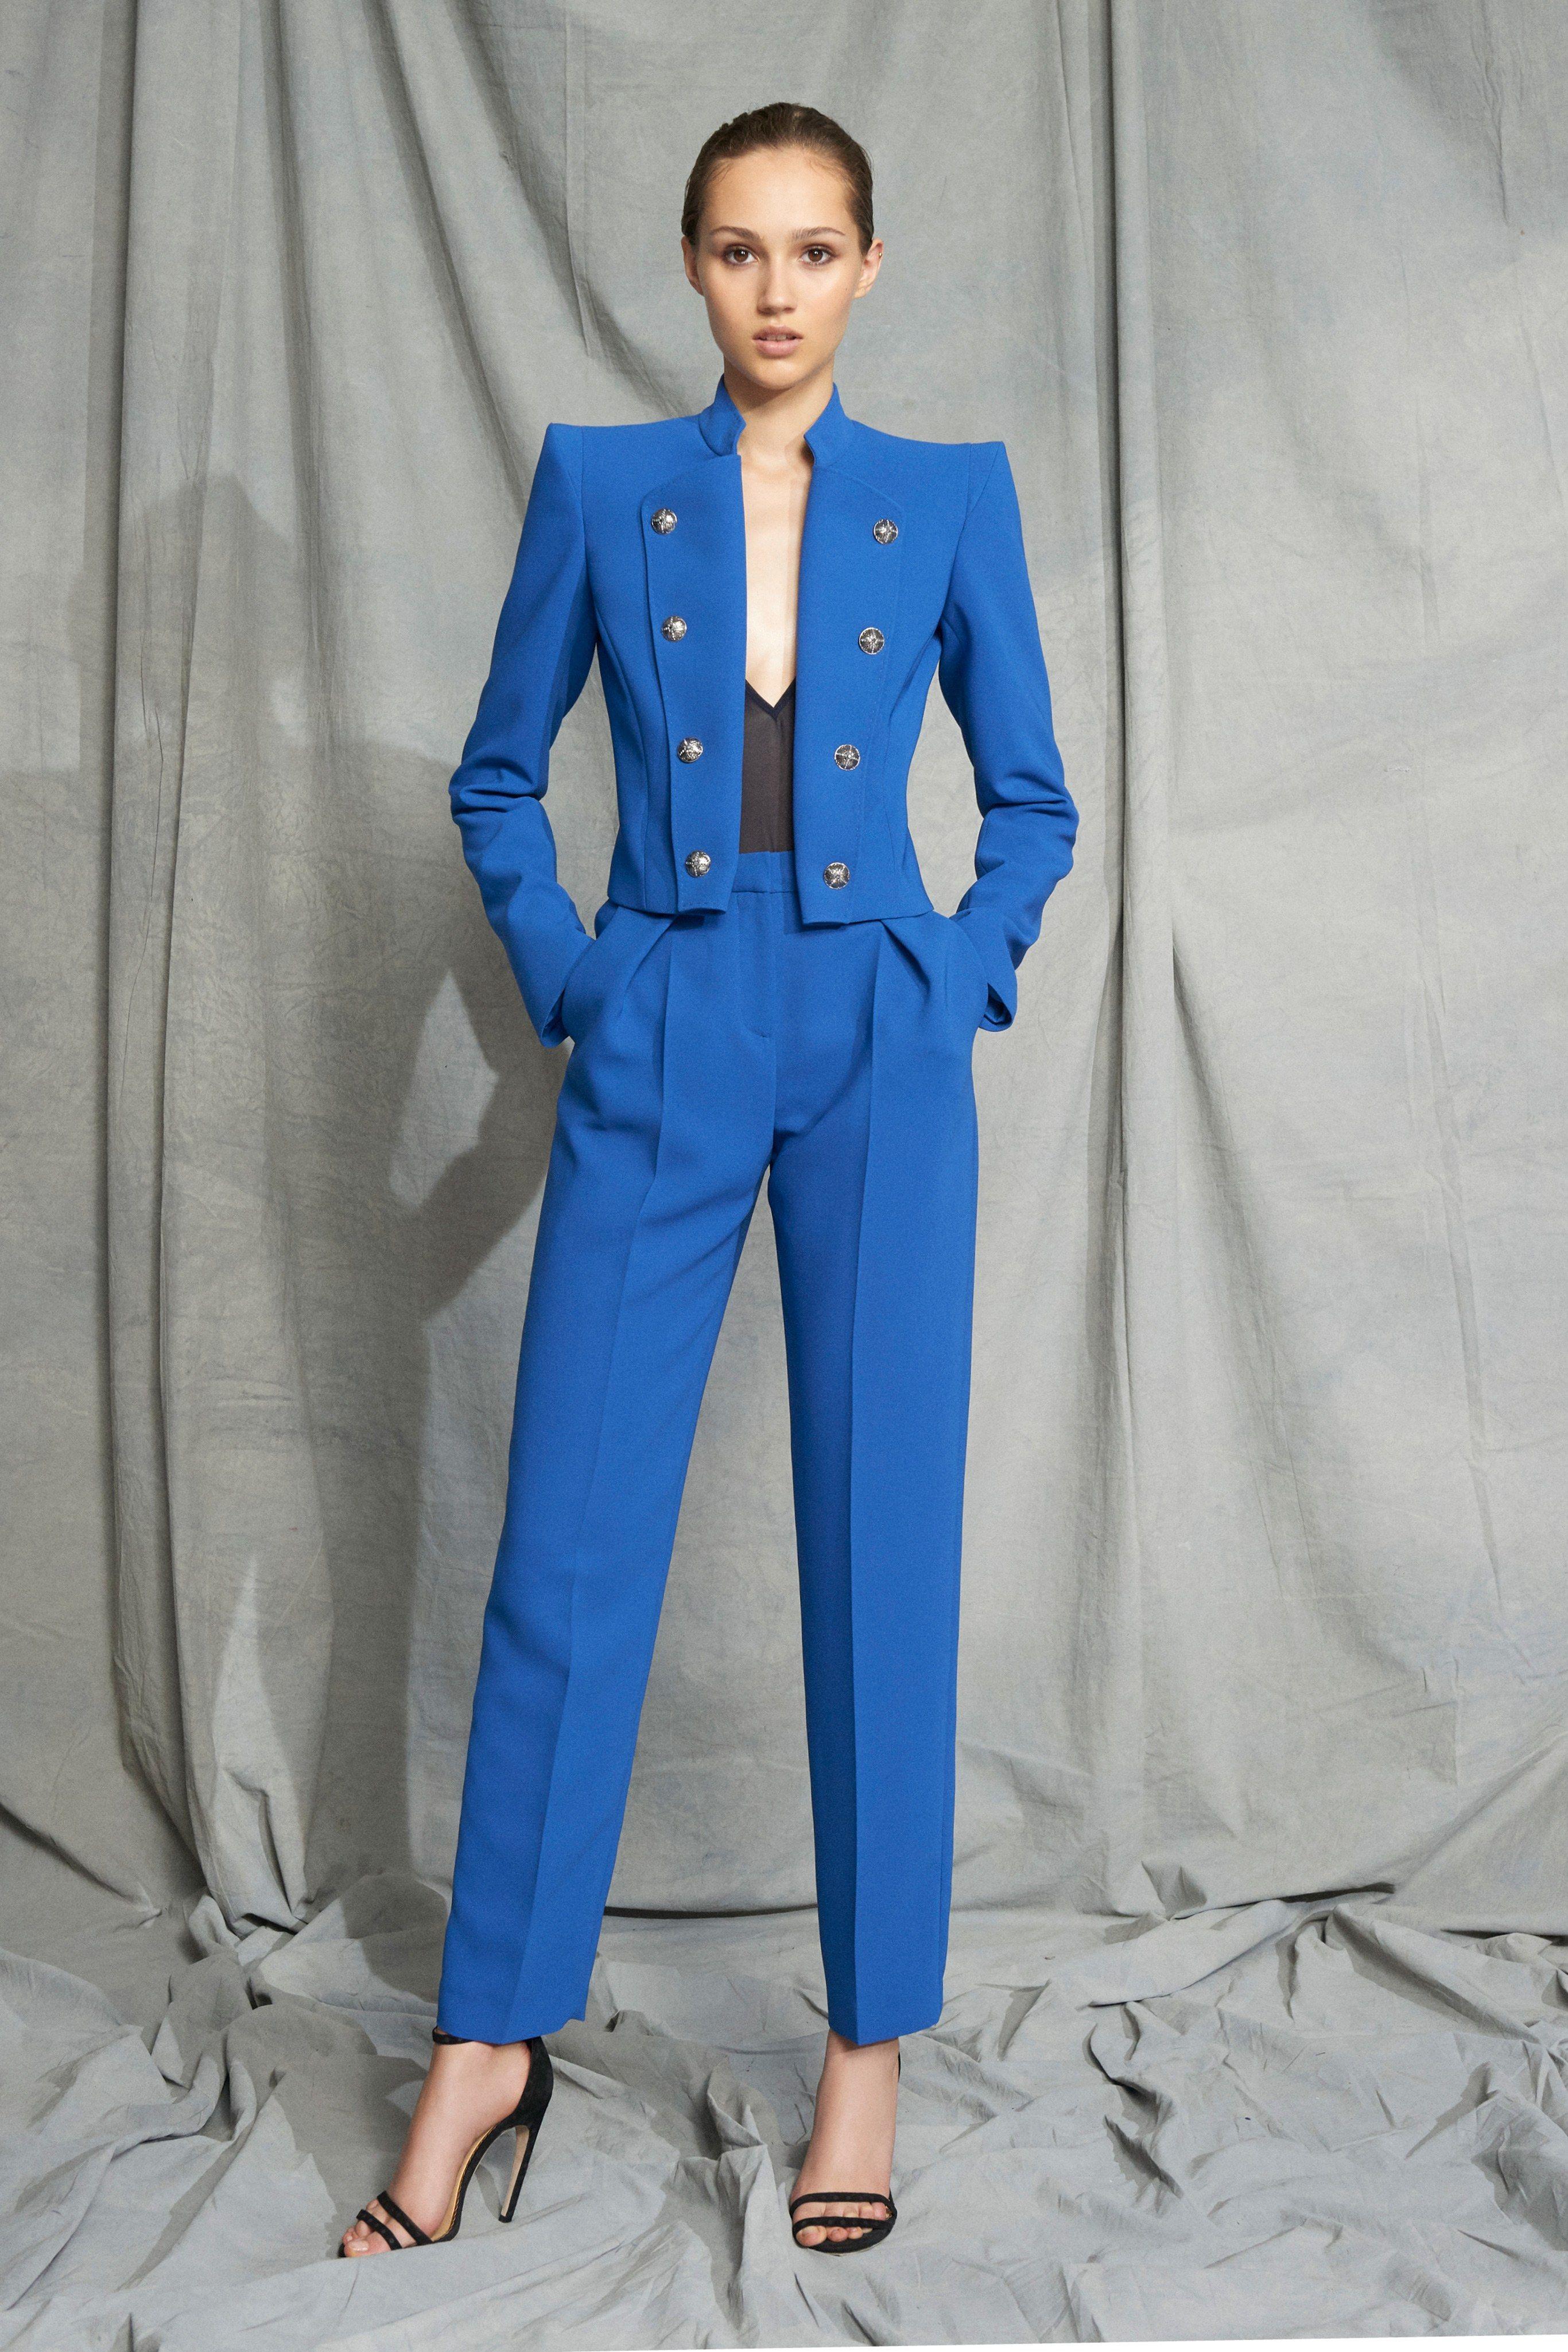 12613c25798e9 Zuhair Murad Resort 2019 Paris Collection - Vogue #clothes  #beautifulclothes #fashion #apparel